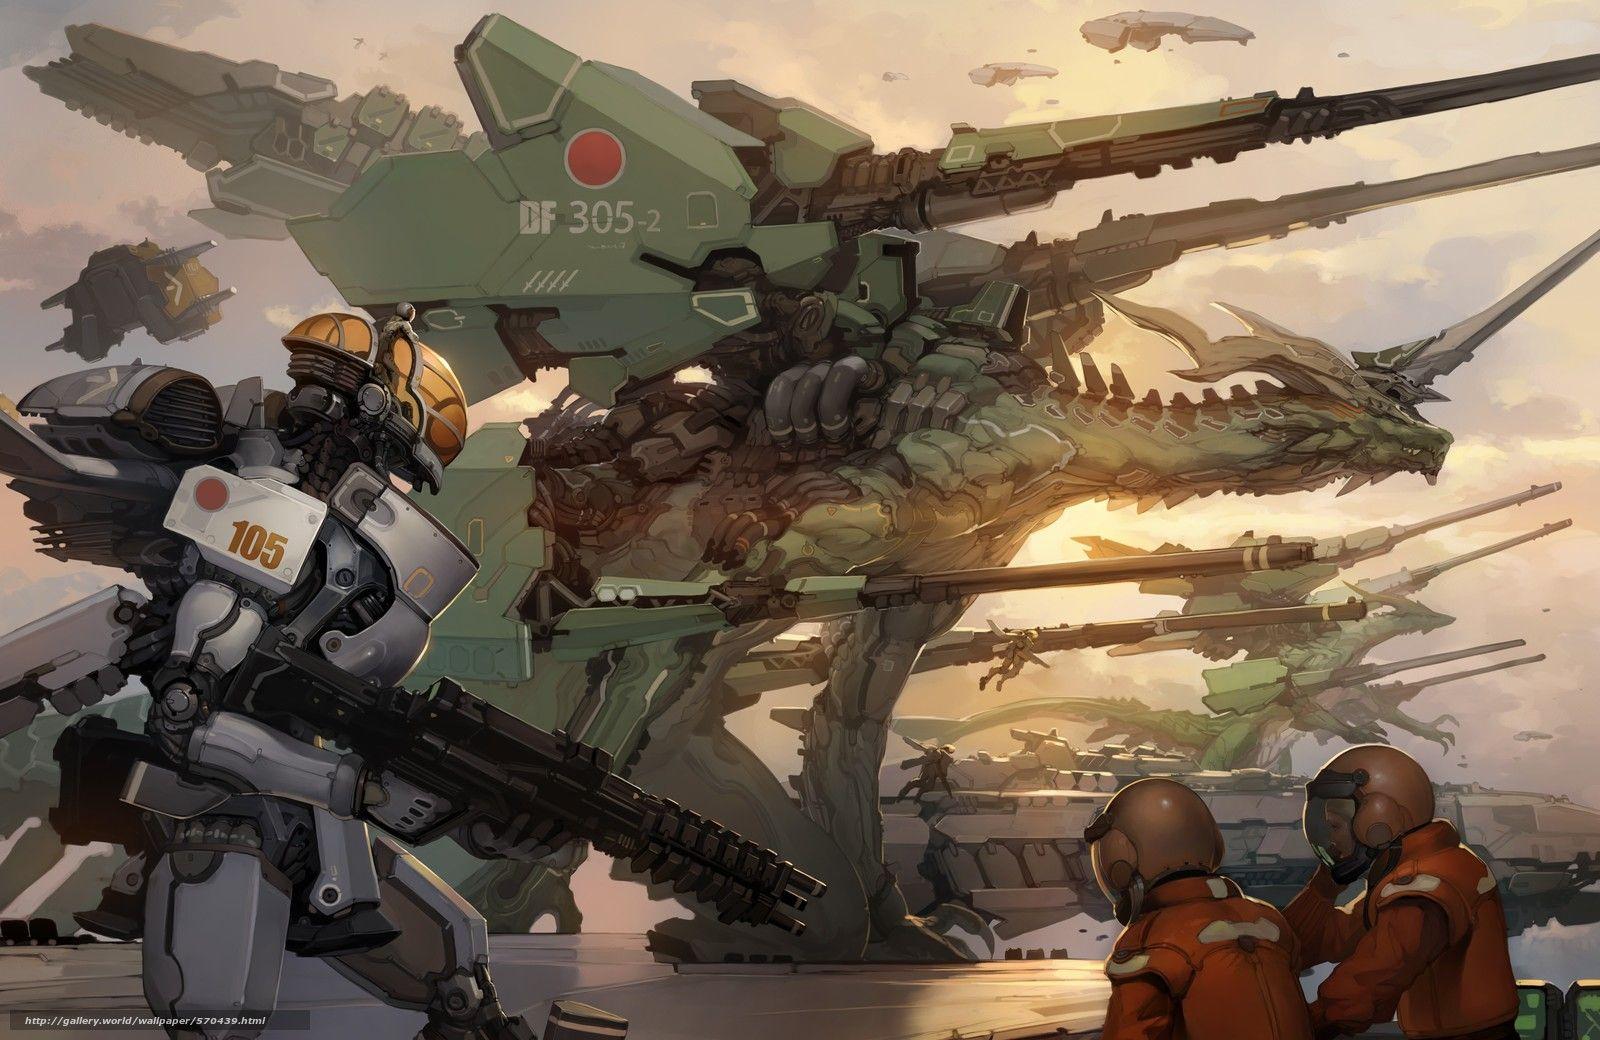 anime war wallpaper - photo #25